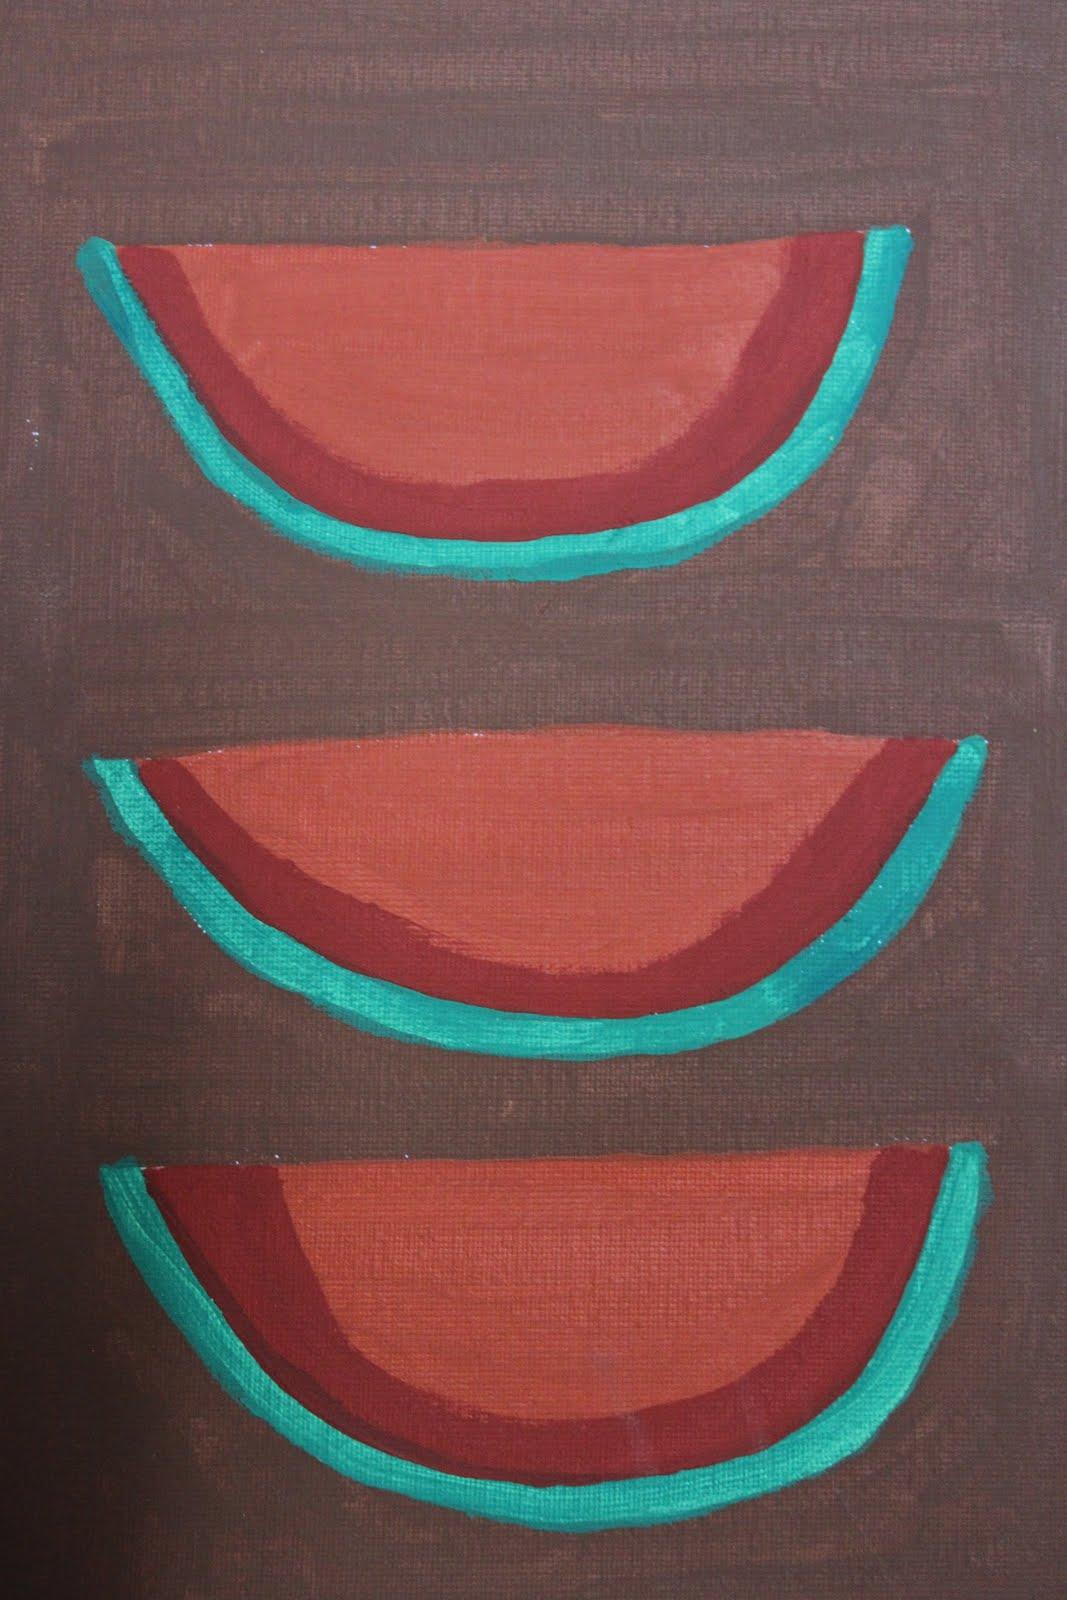 Arte y Comunicacin Rplica de Obra Las Sandas